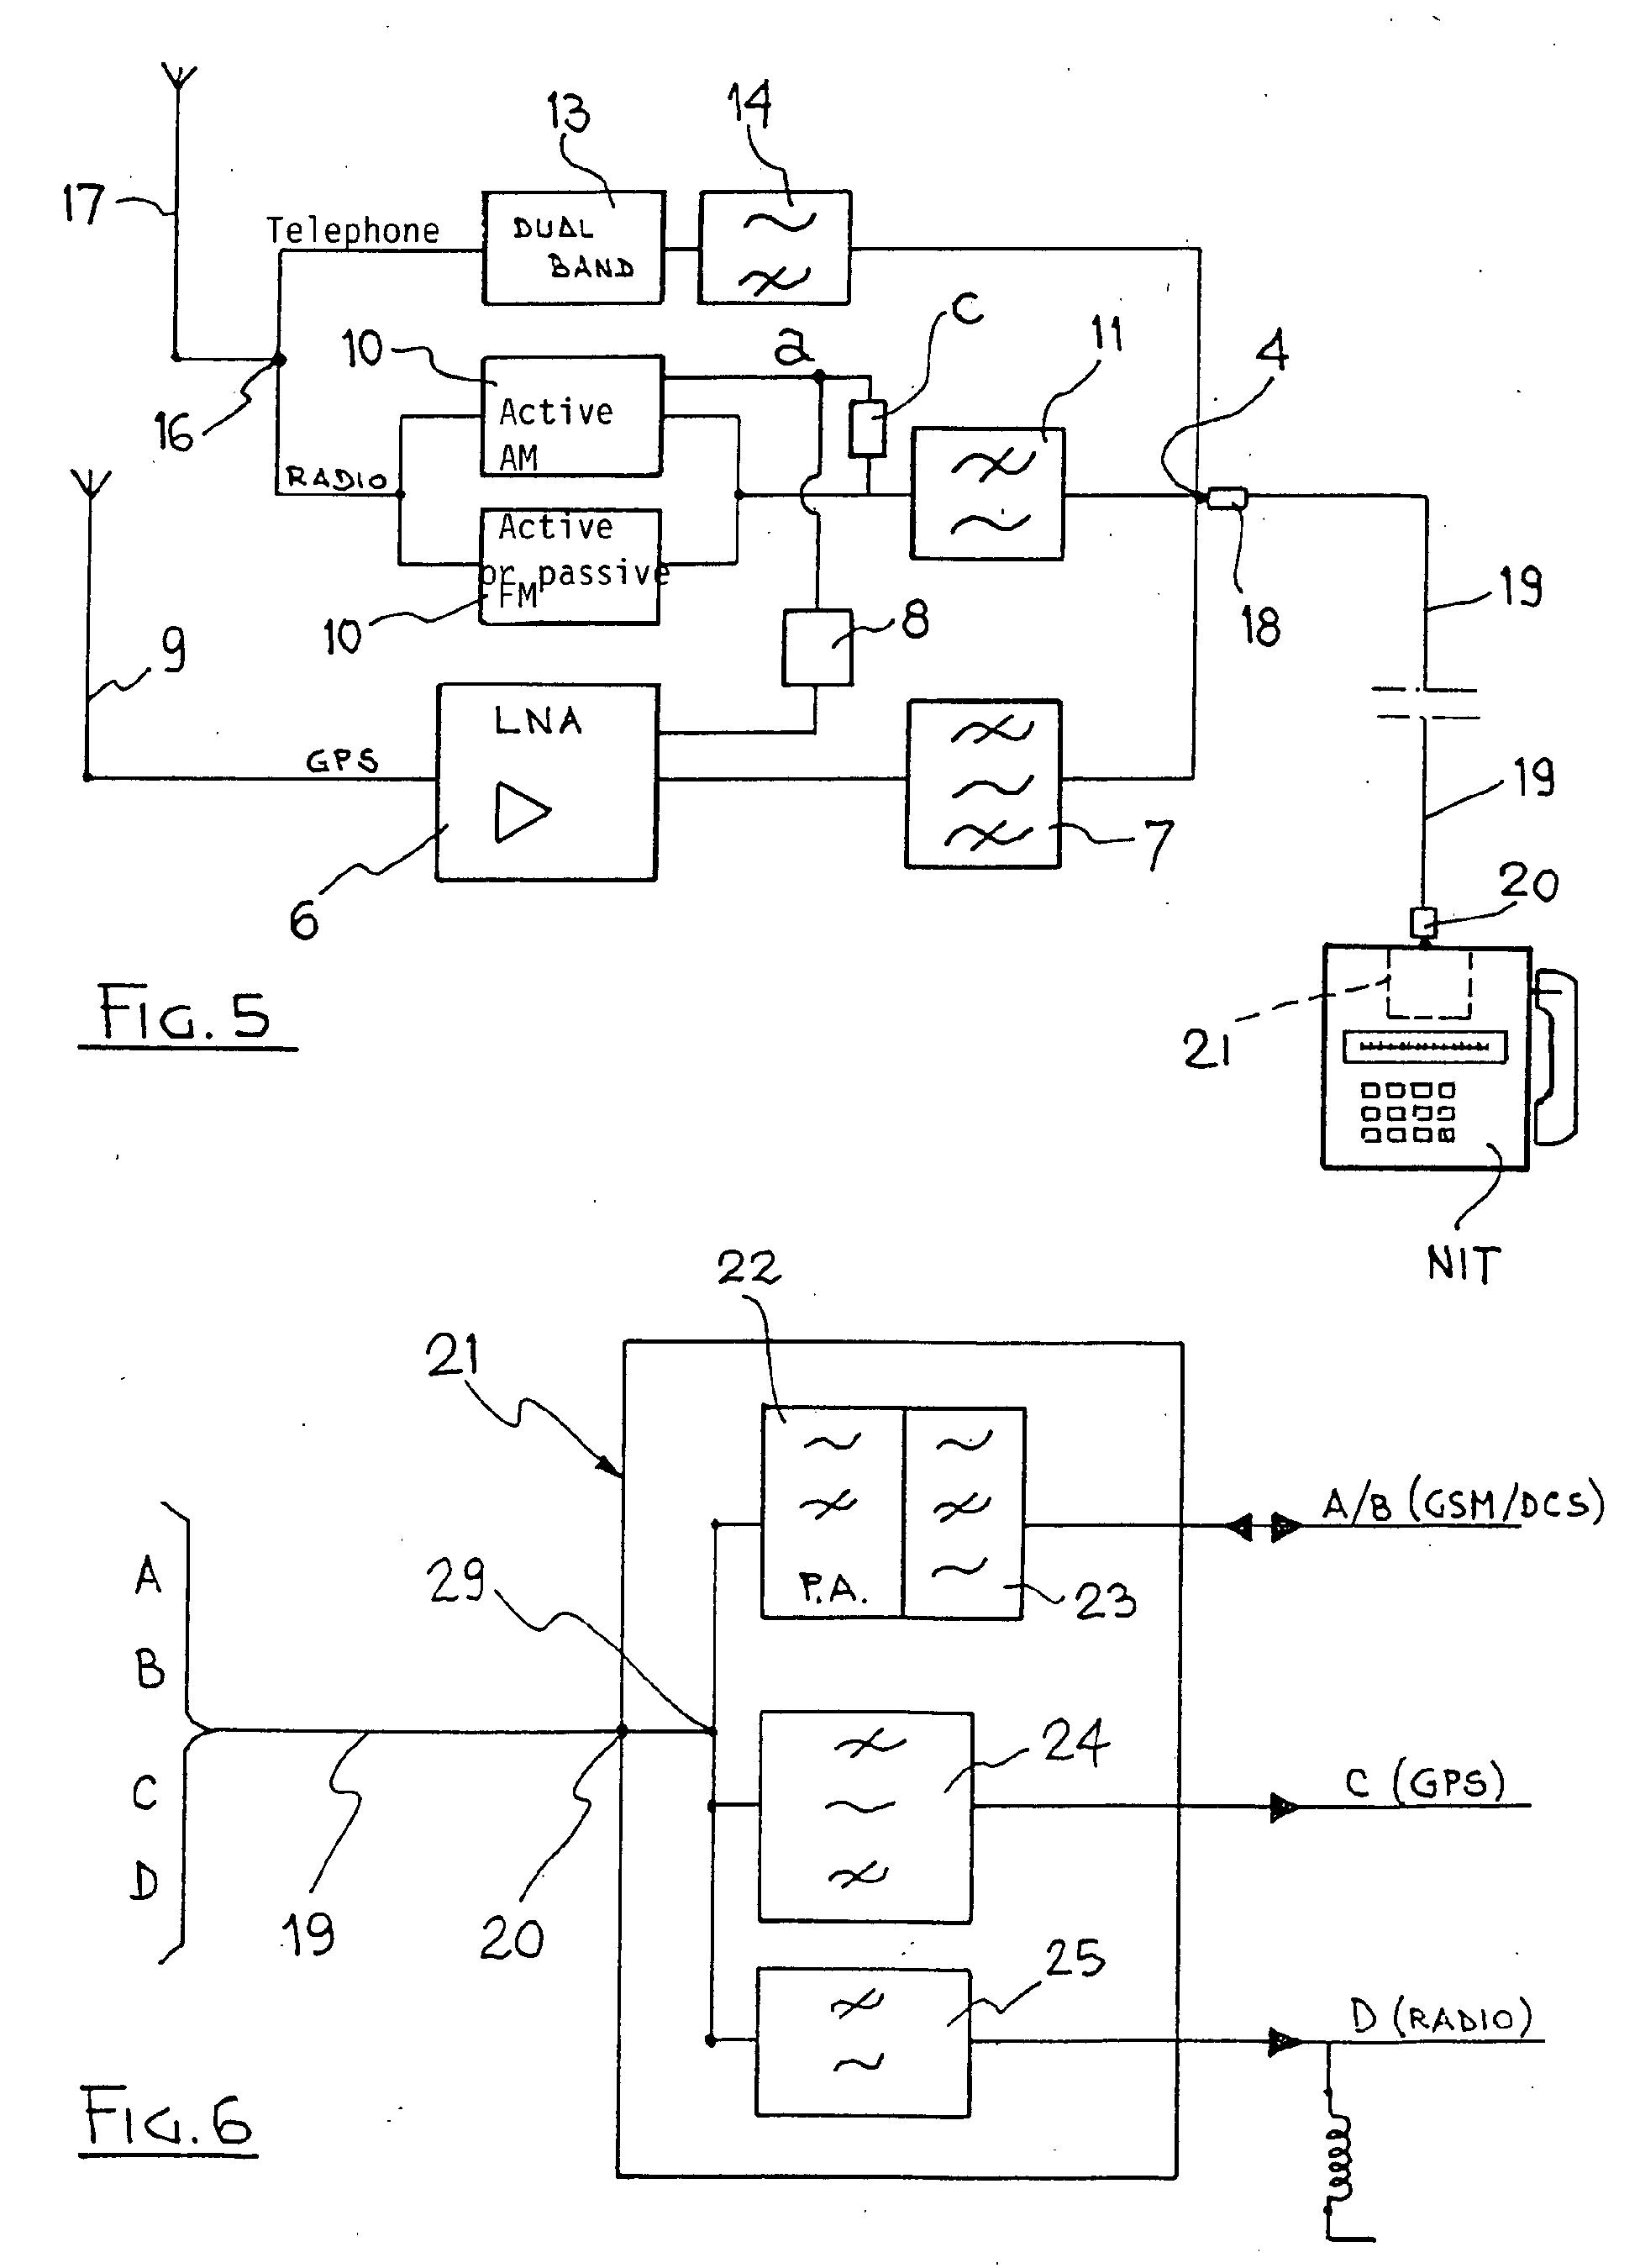 external fm antenna wiring diagram diagram of 1997 jeep